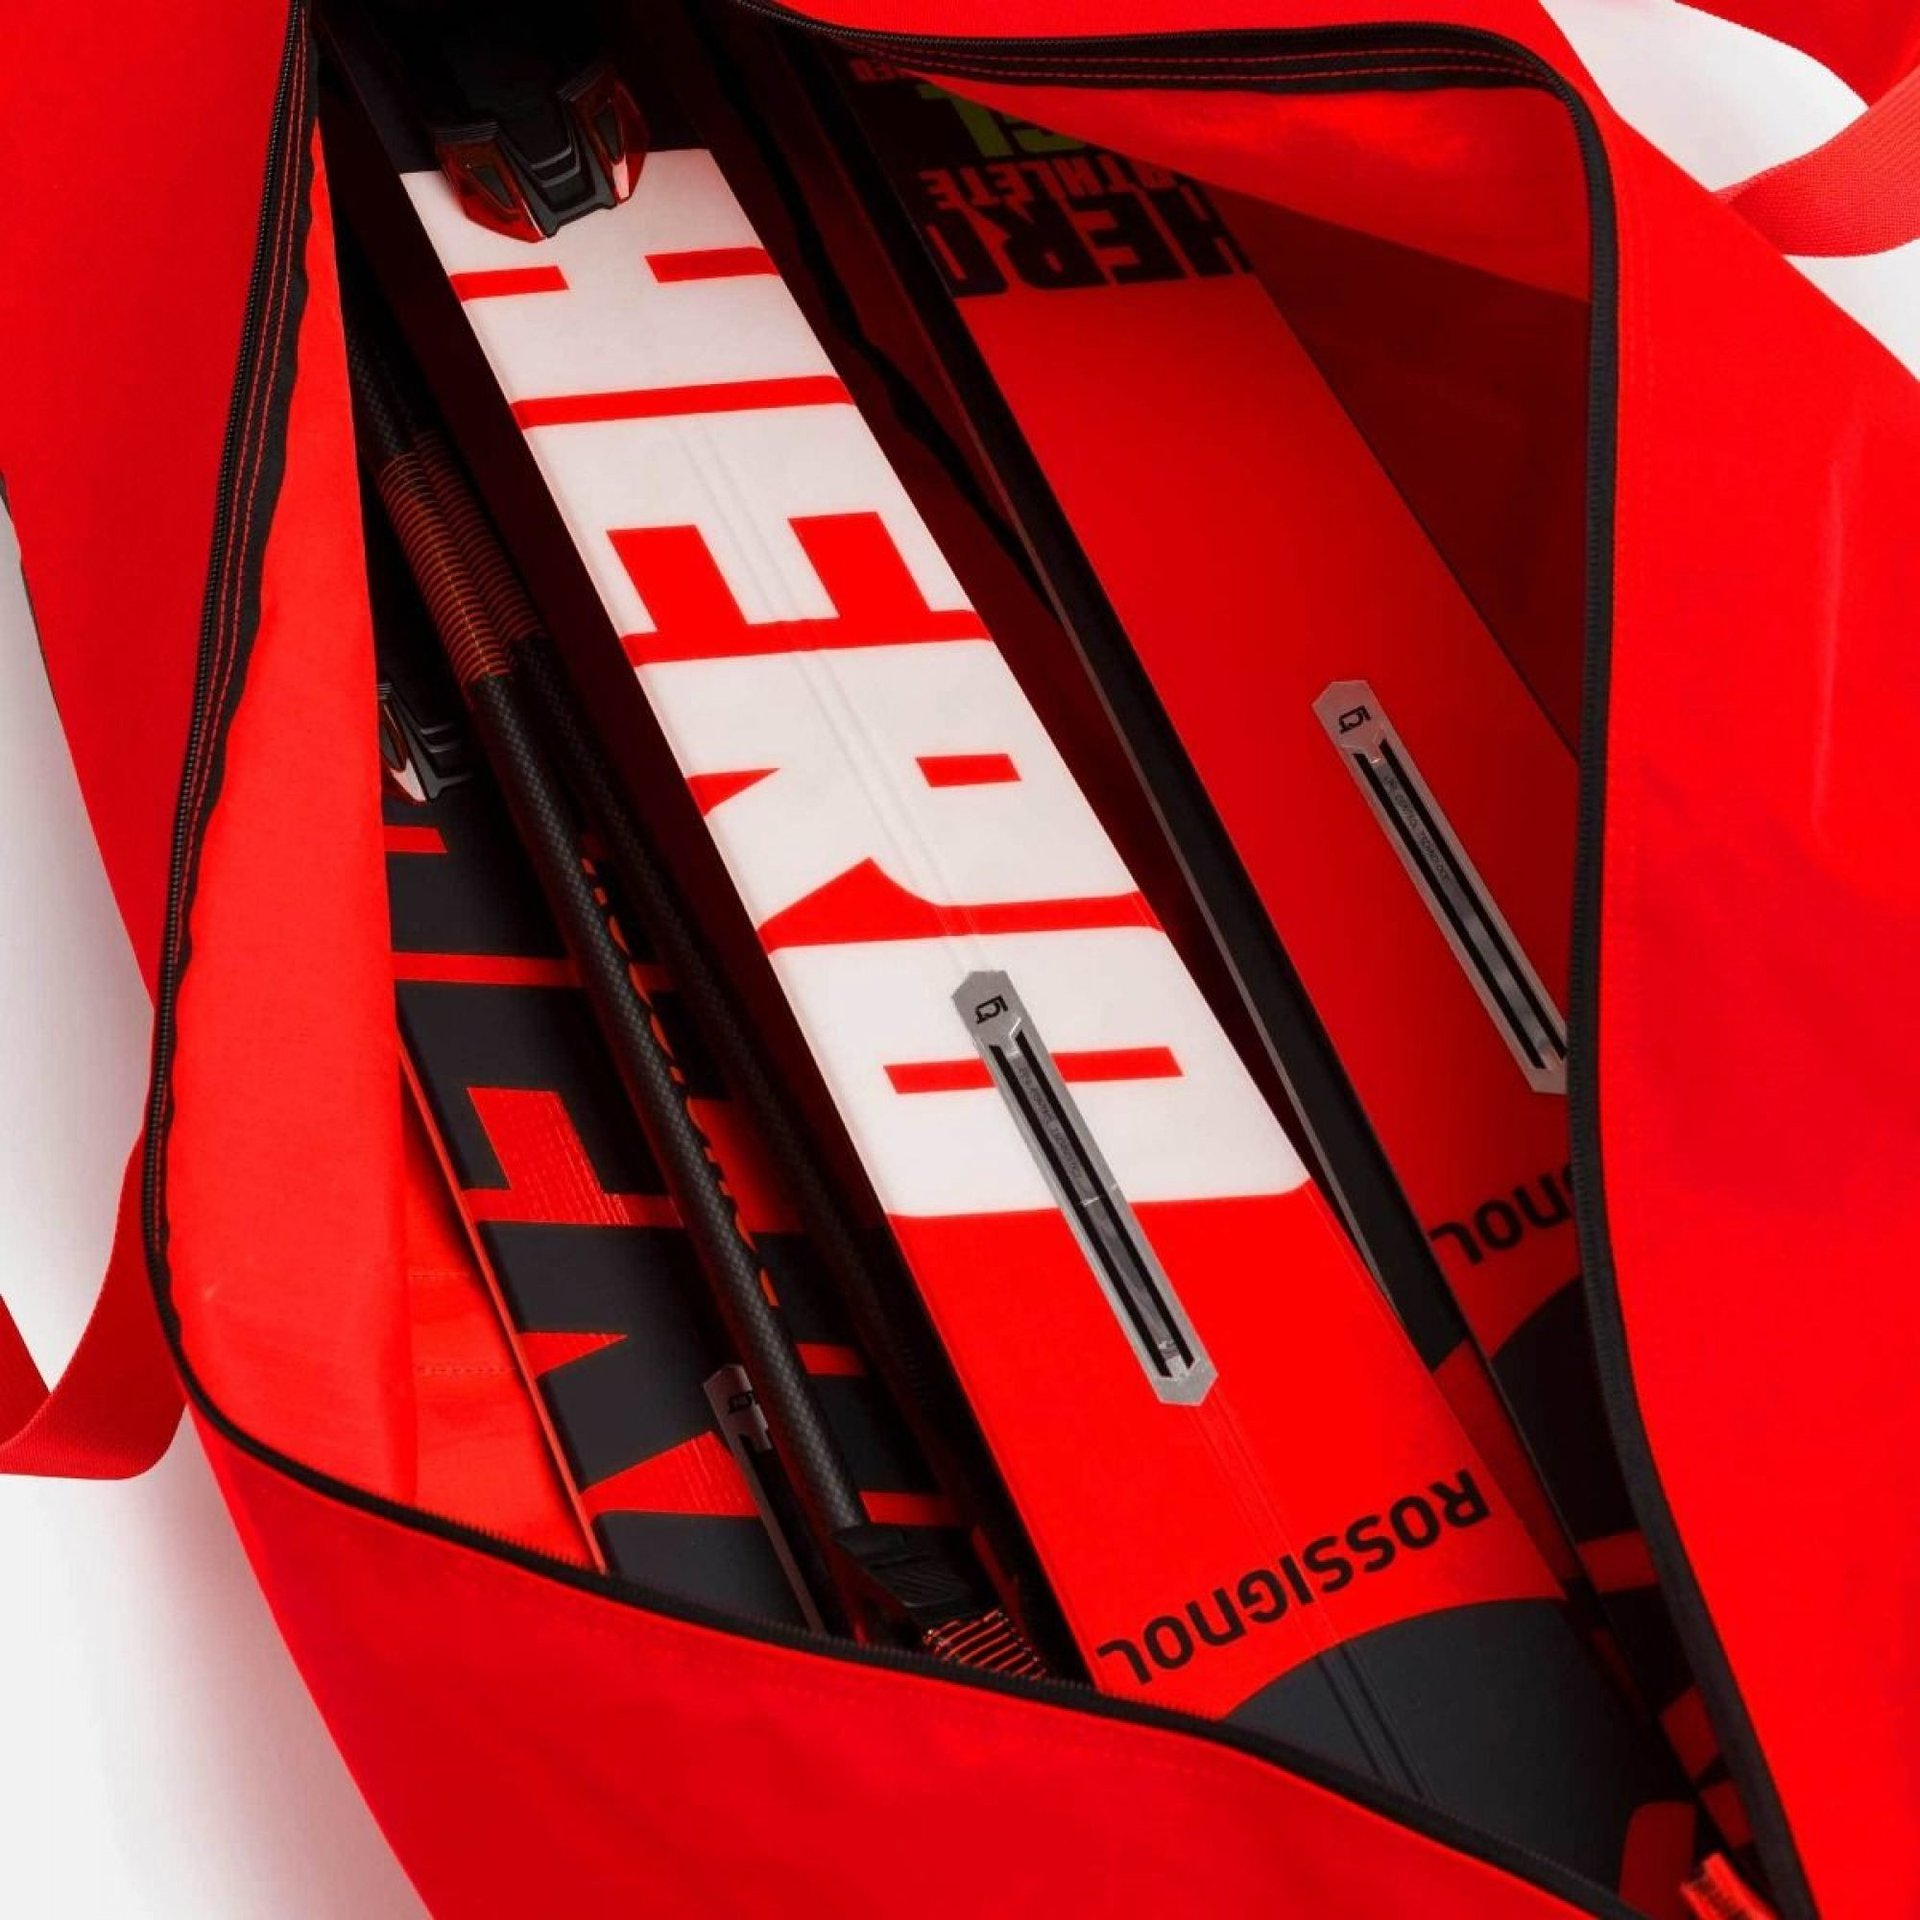 POKROWIEC NA NARTY ROSSIGNOL HERO JR SKI BAG 170 CM RED 3